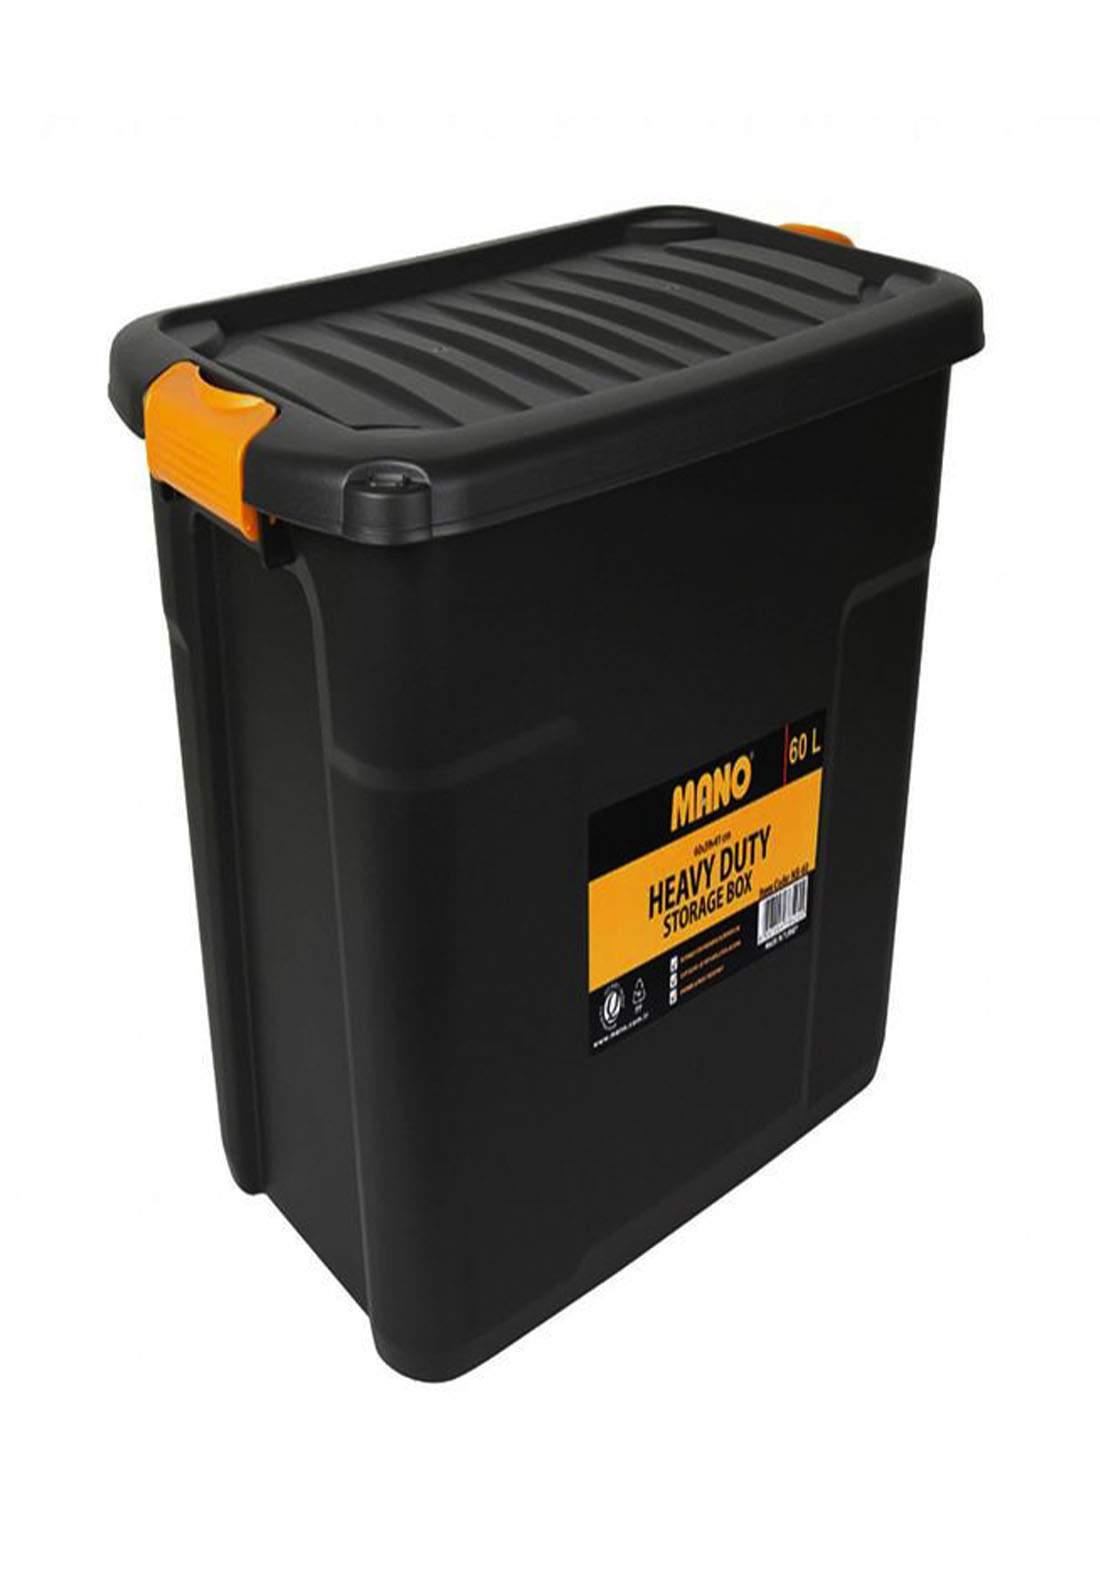 Mano NB-60 Storage Box 60L صندوق تخزين